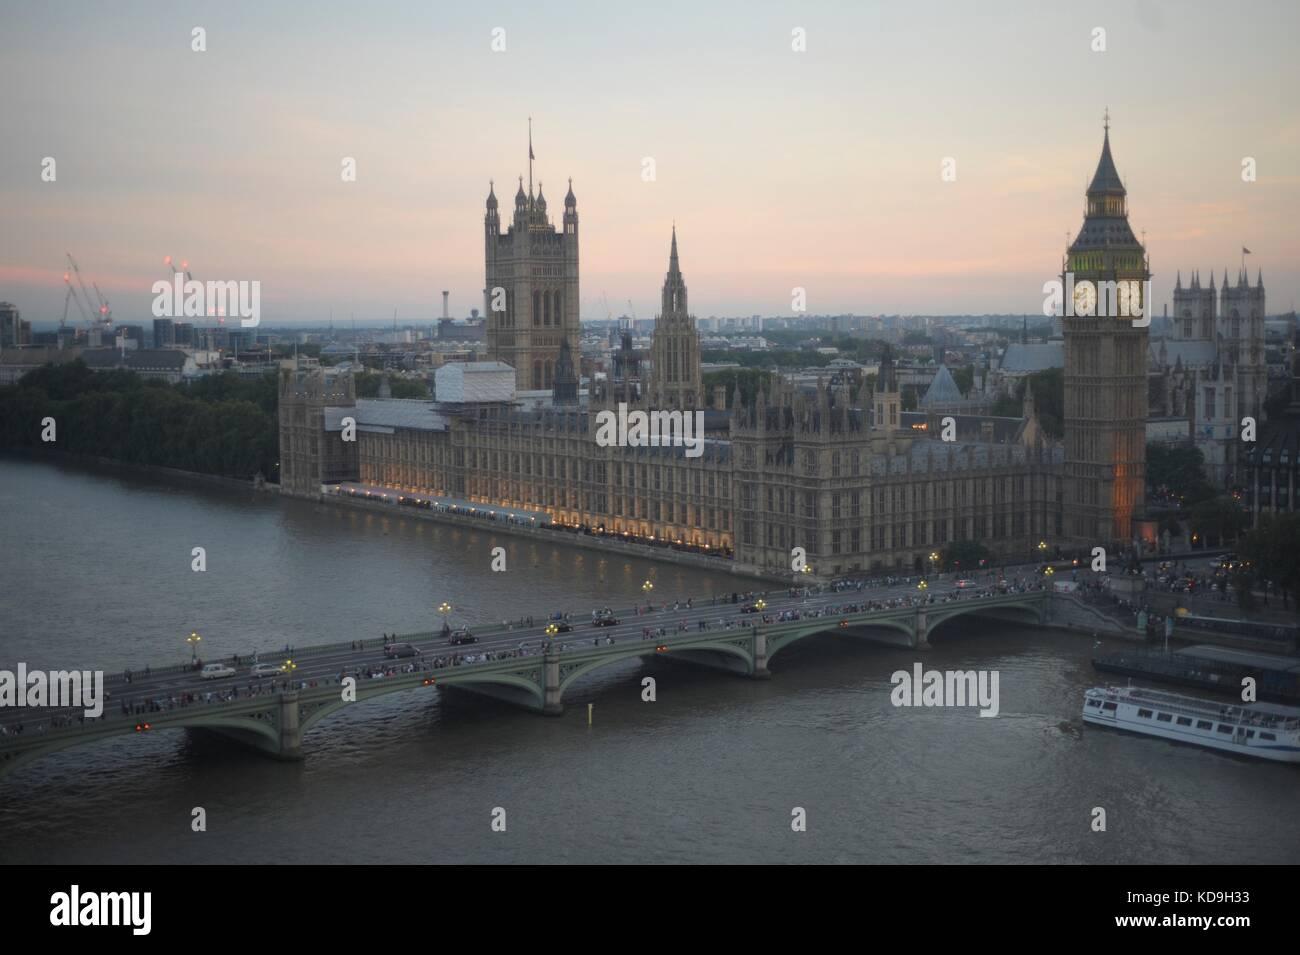 Aerial views of London - Stock Image